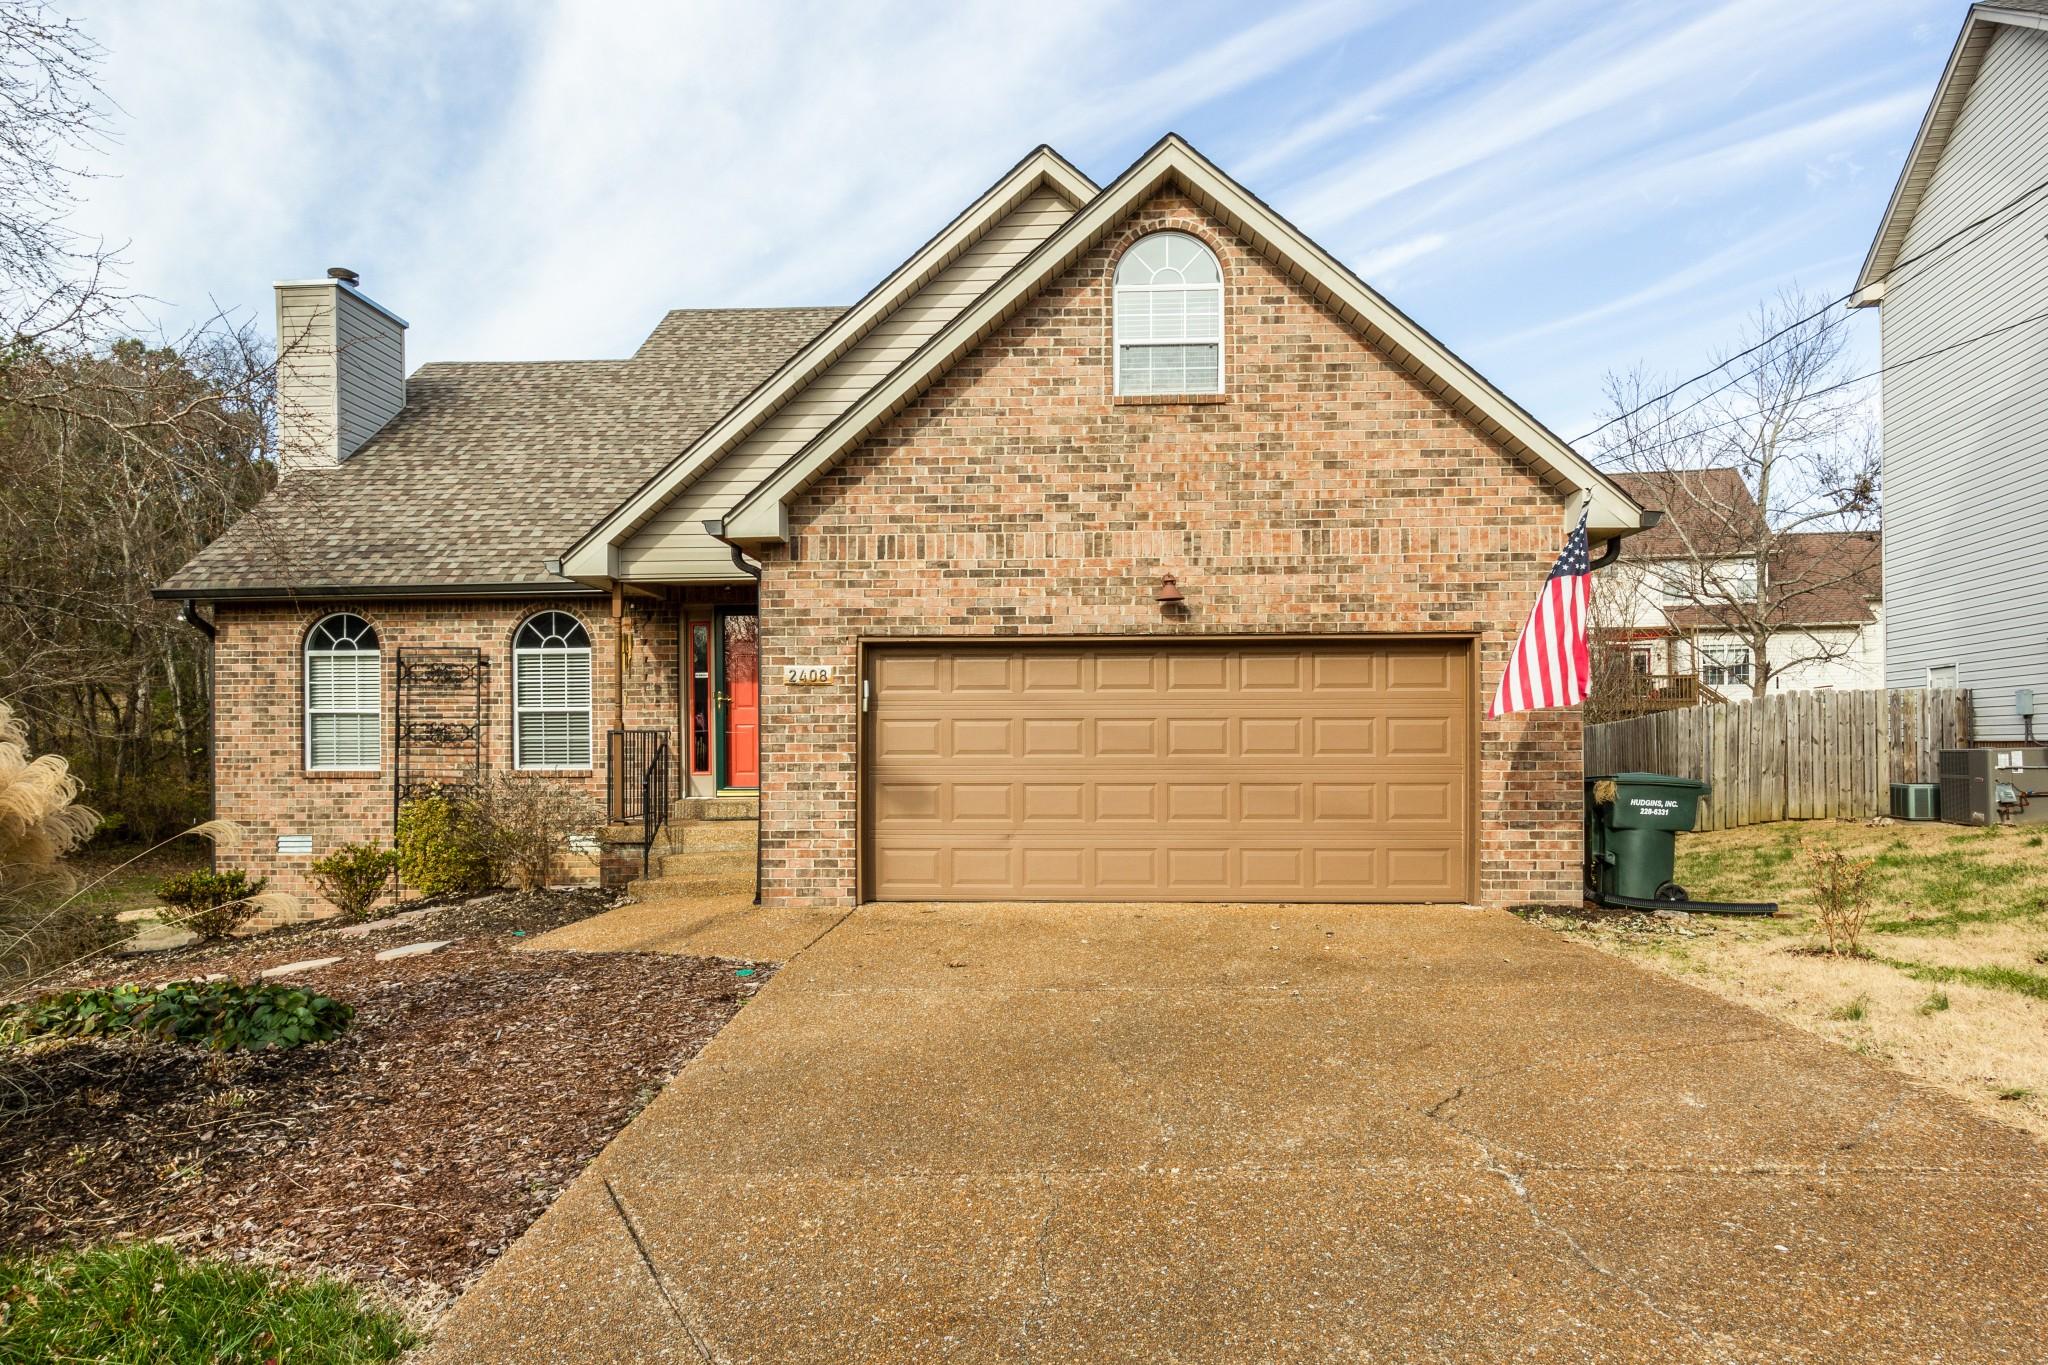 2408 Rollett Ct, Nashville, TN 37211 - Nashville, TN real estate listing